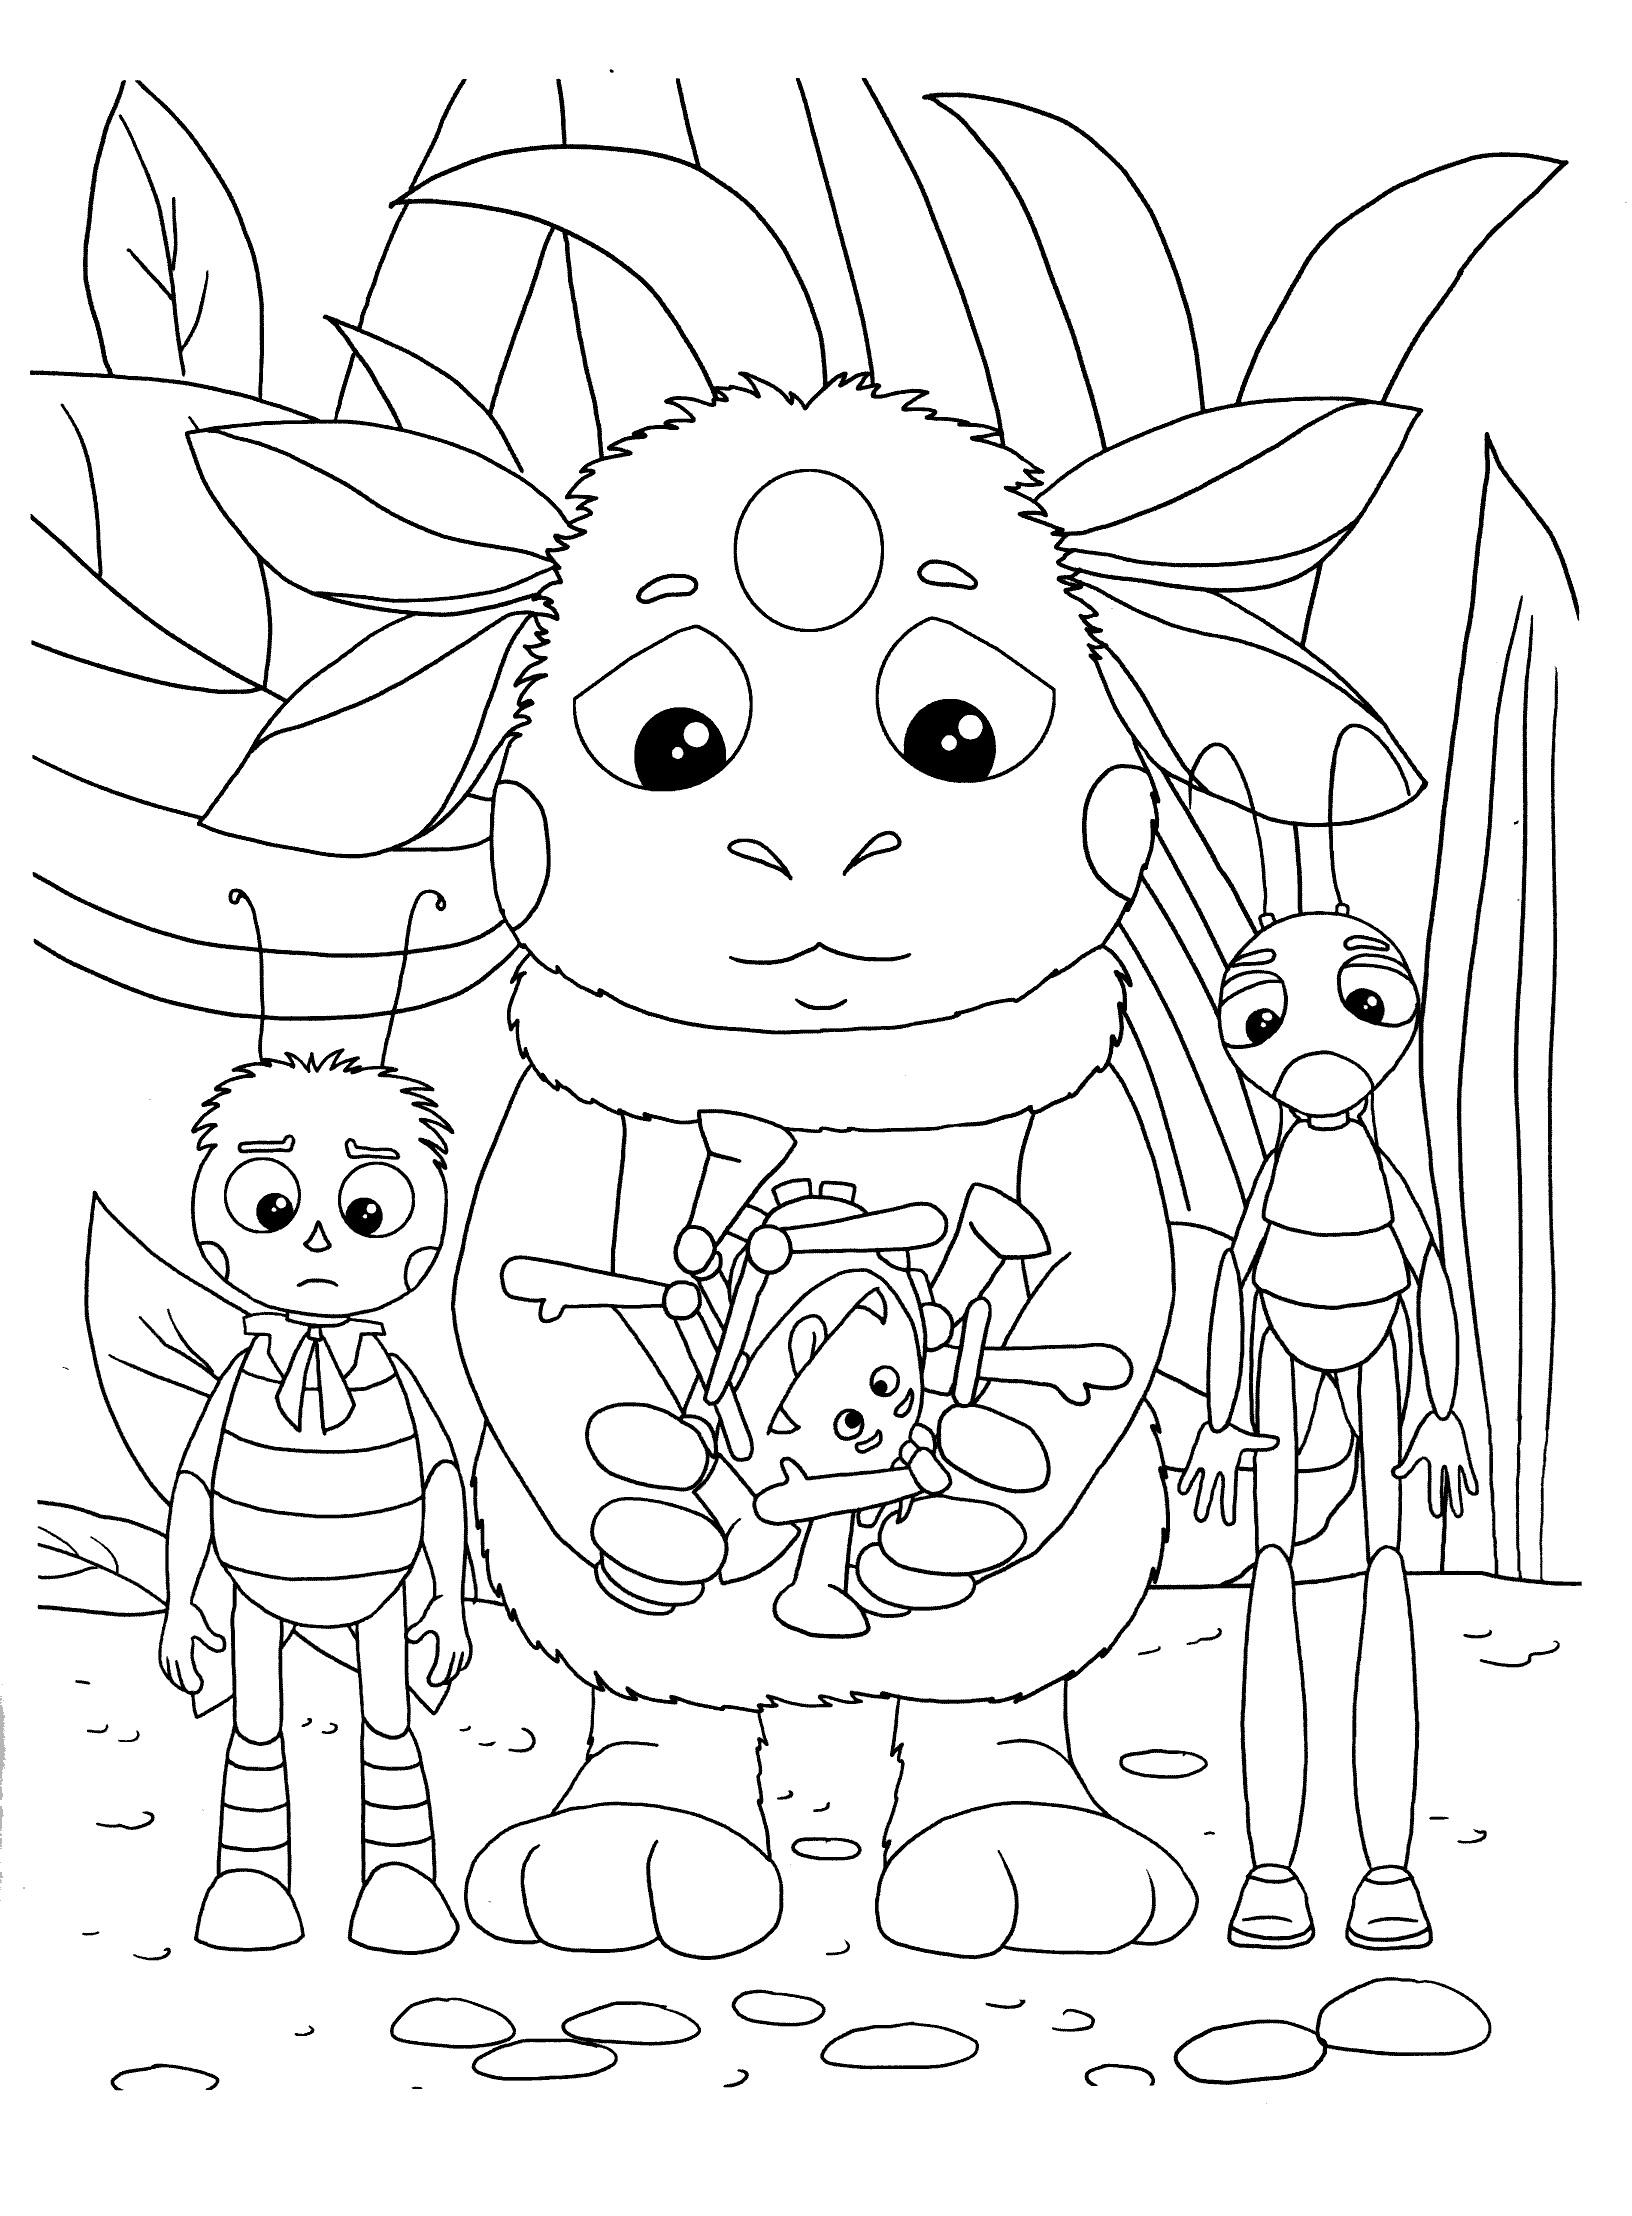 Раскраски лунтик для детей онлайн бесплатно